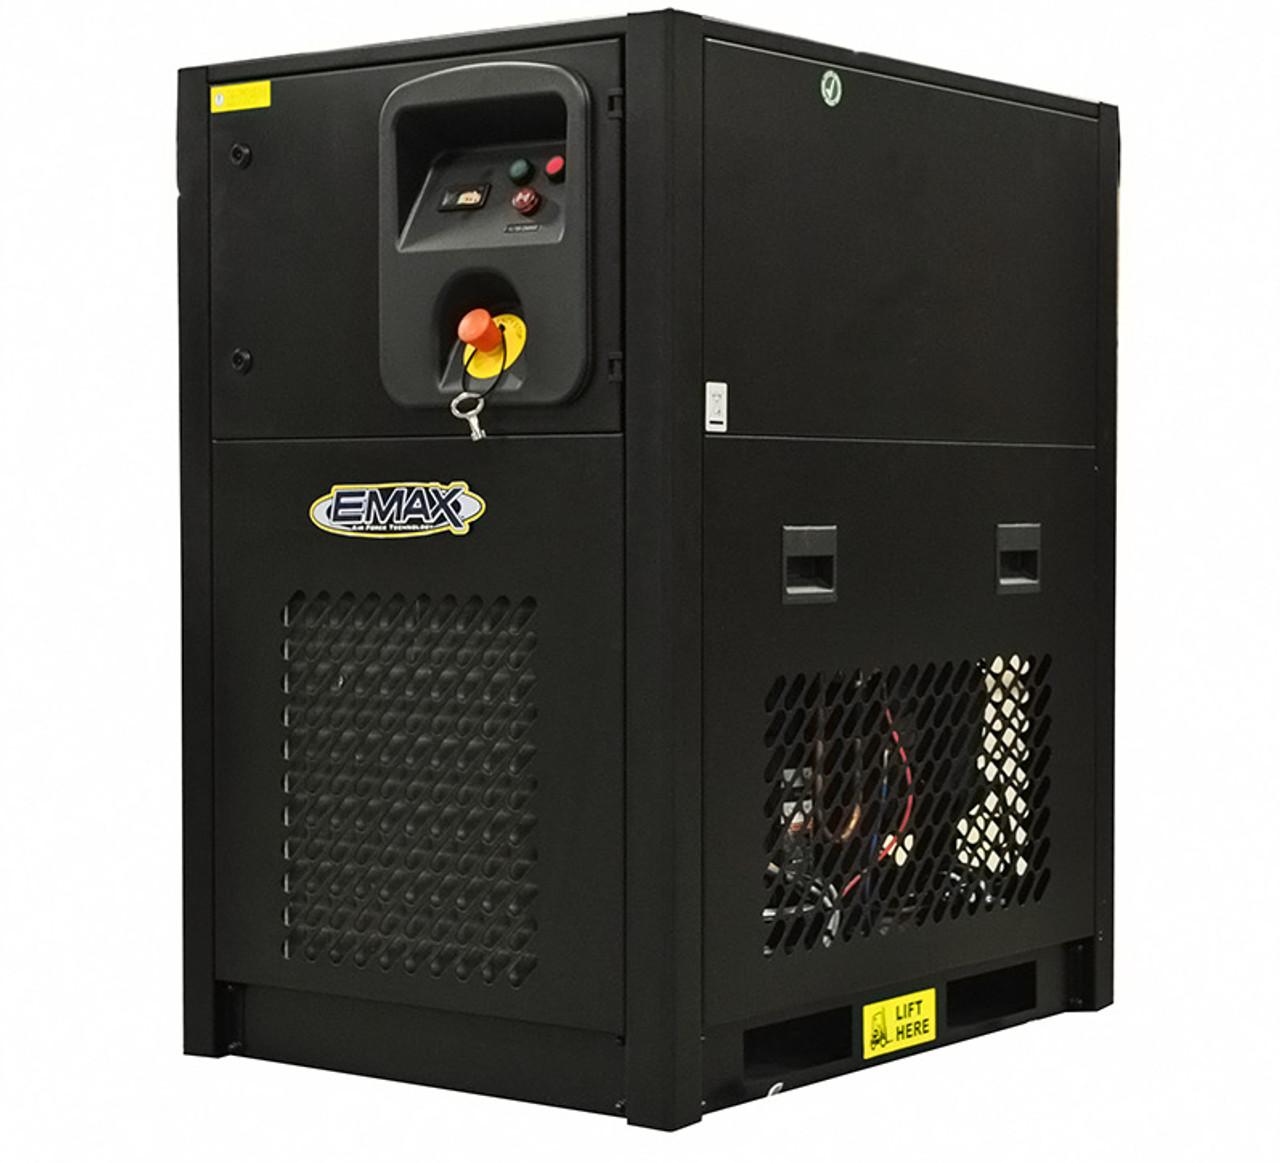 EMAX EDRCF2300288 288 CFM Refrigerated Air Dryer 230 Volt Three Phase